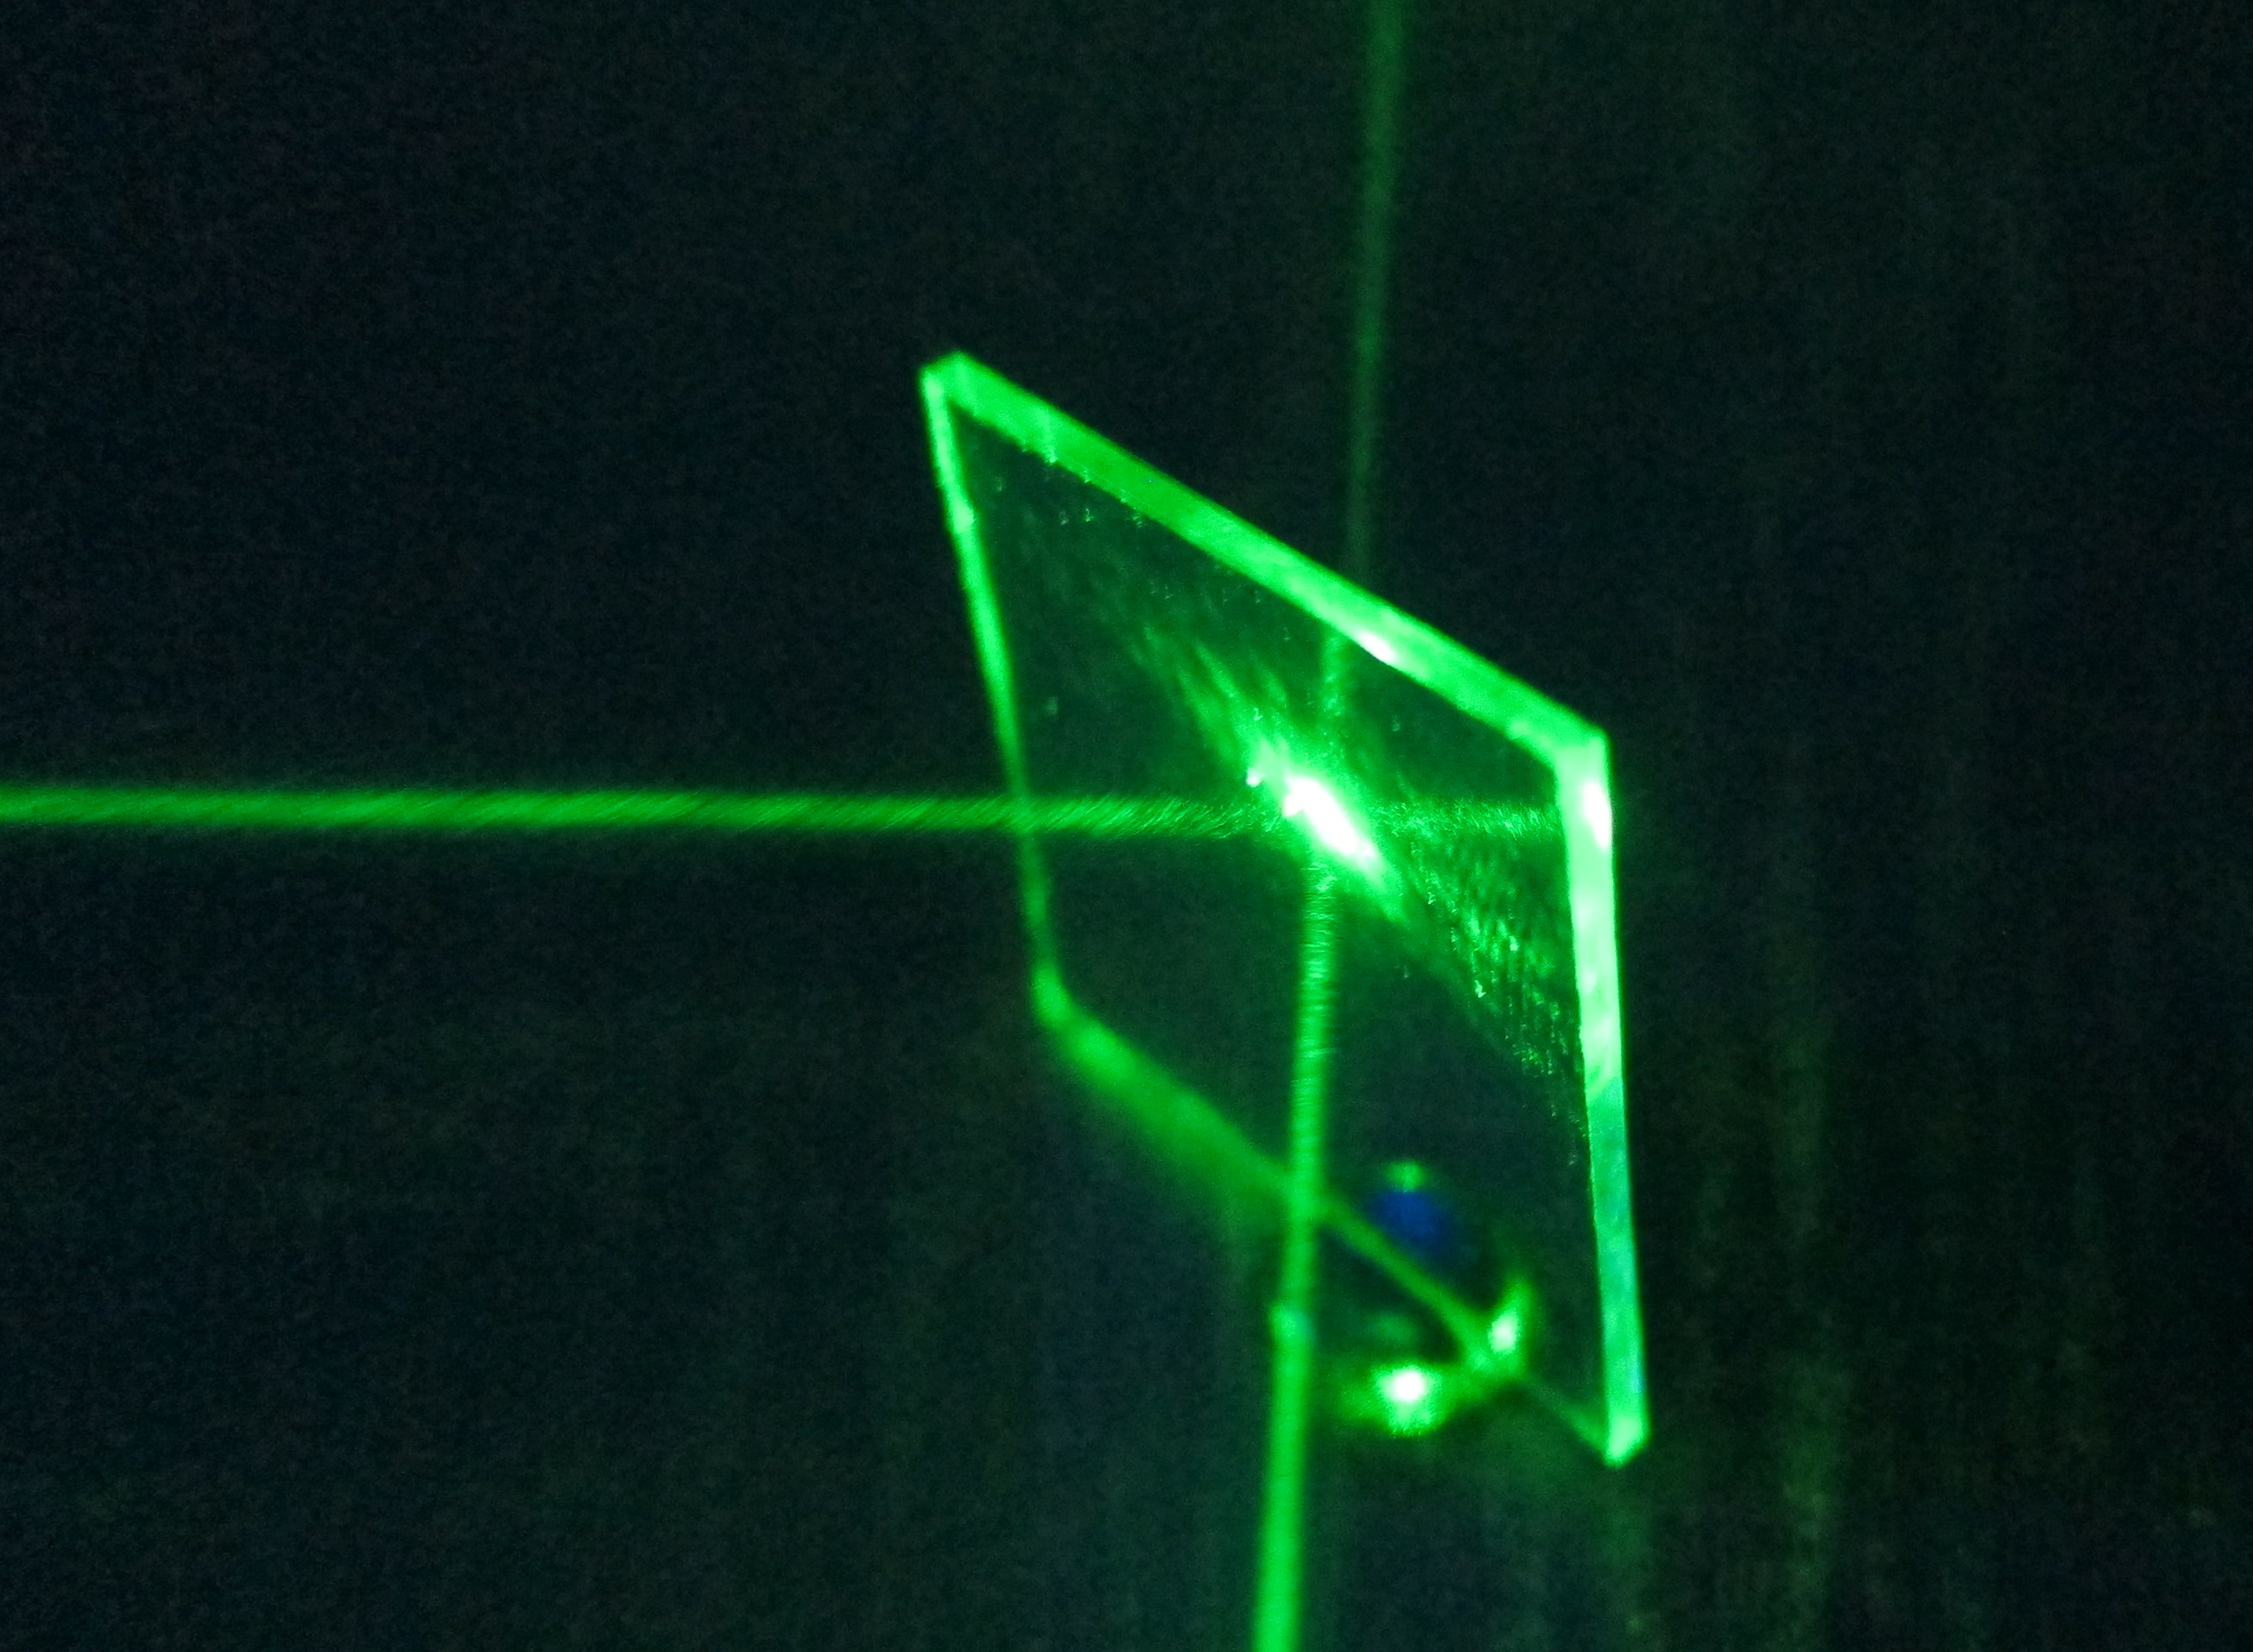 micro optics reflection